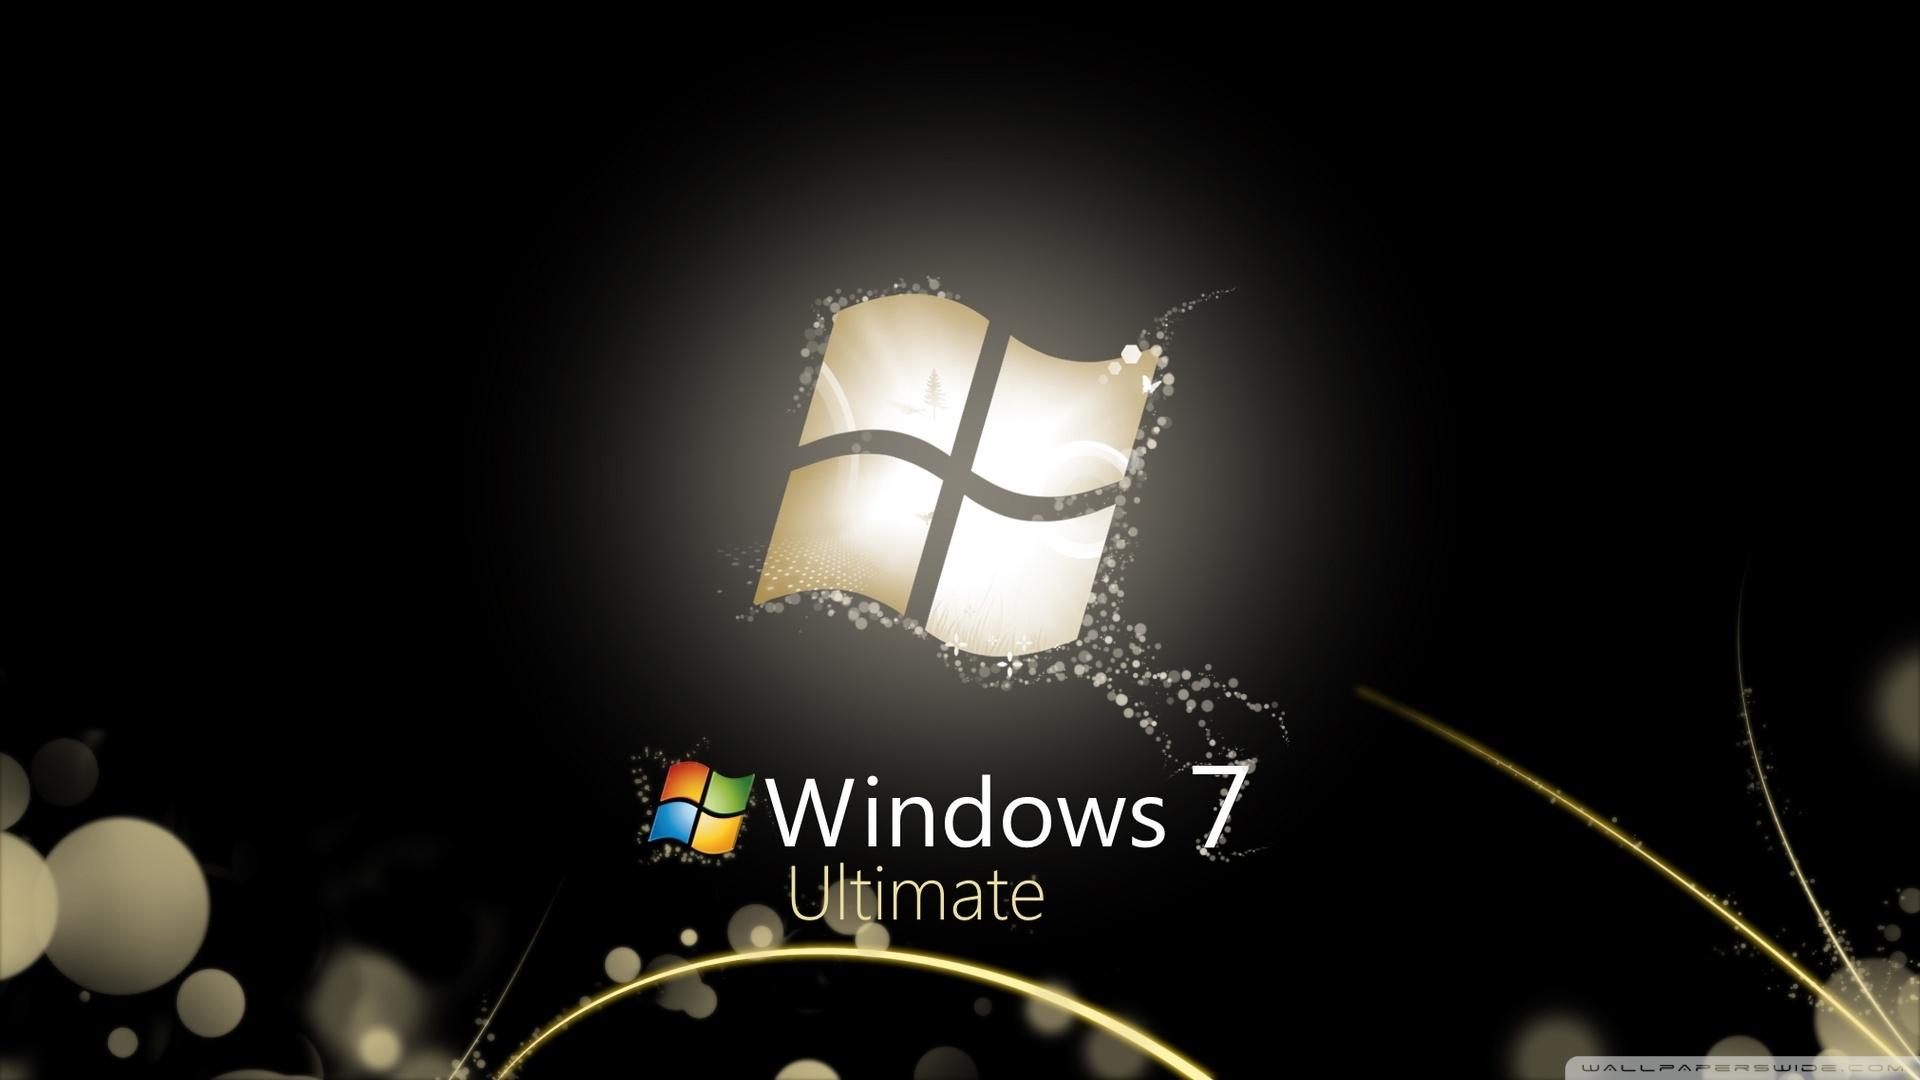 windows 7 ultimate bright black ❤ 4k hd desktop wallpaper for 4k